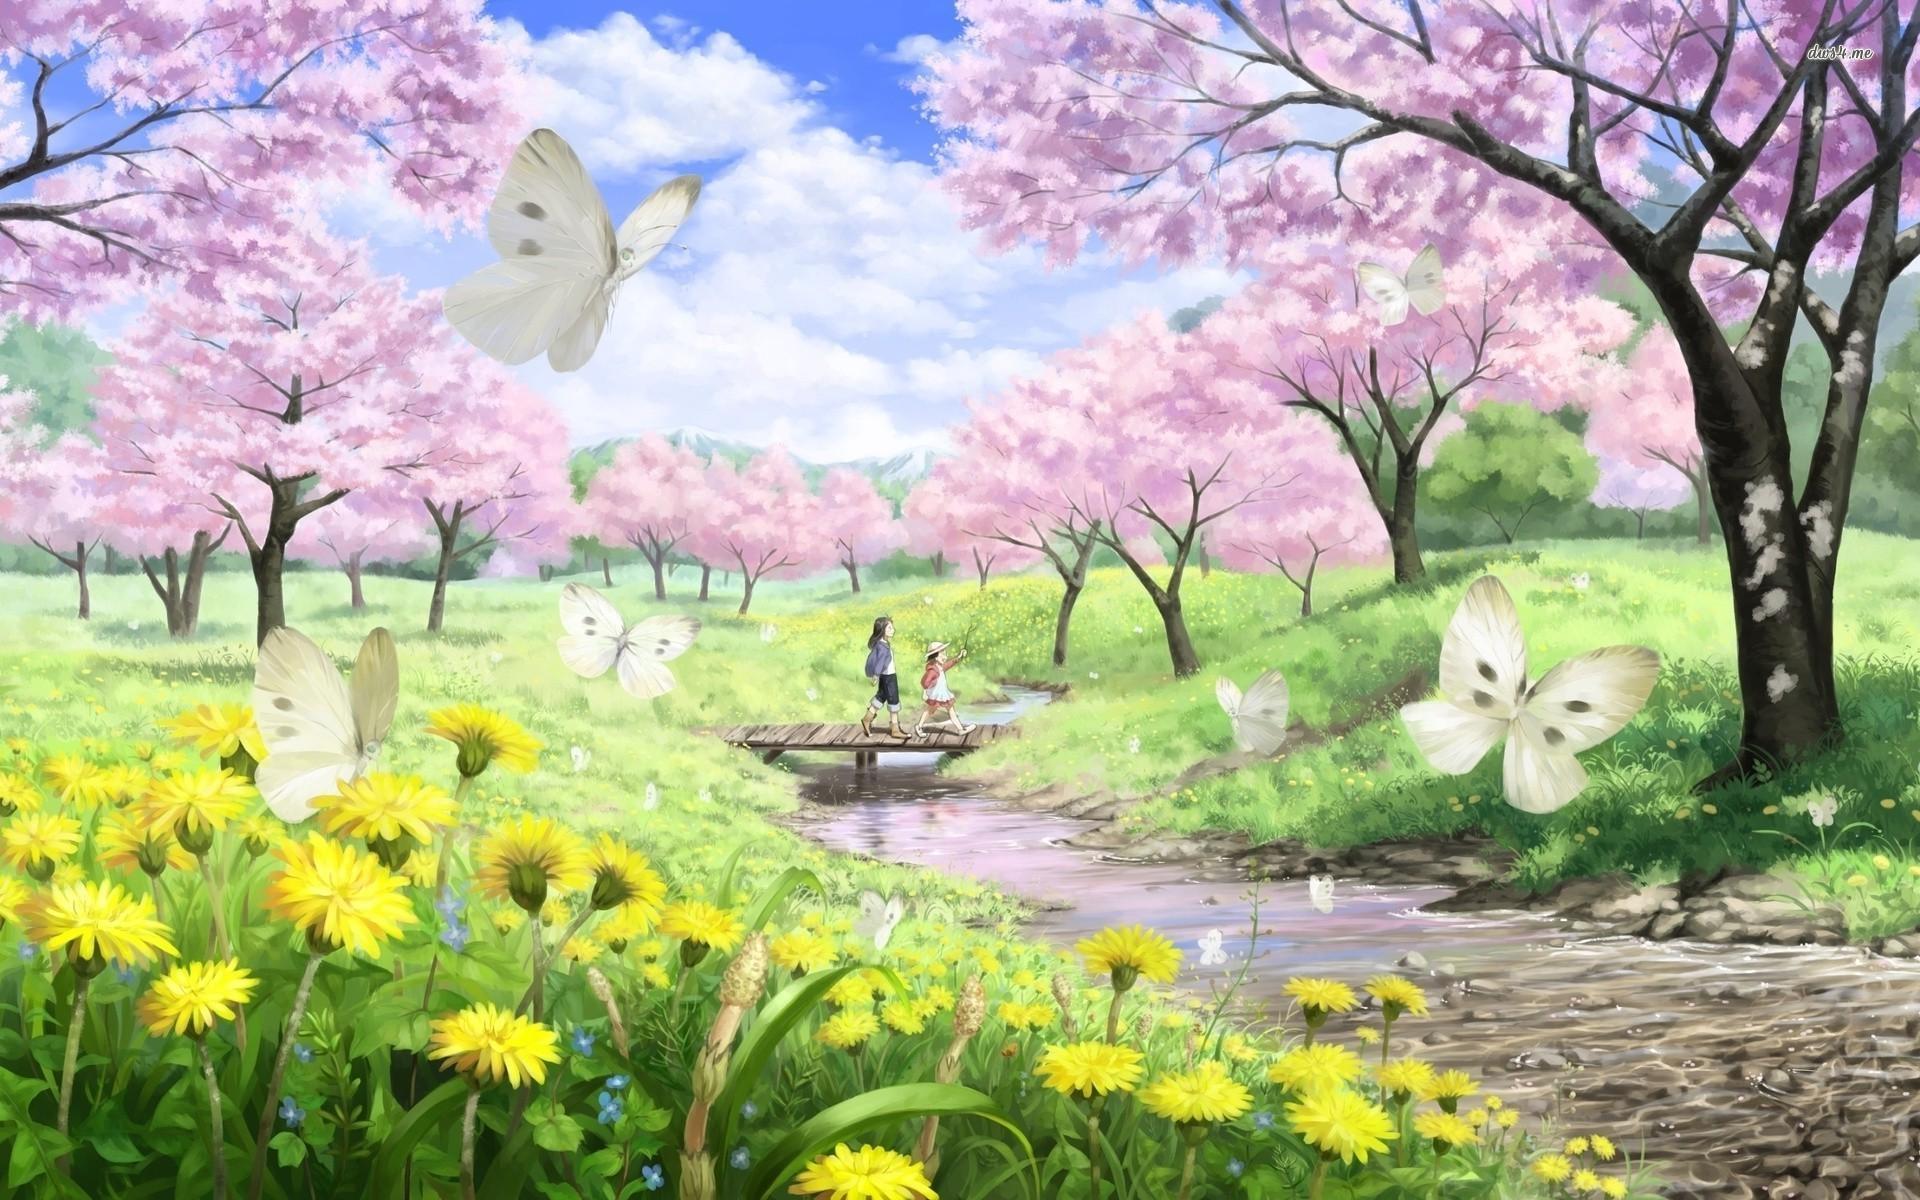 spring nature wallpaper - sf wallpaper